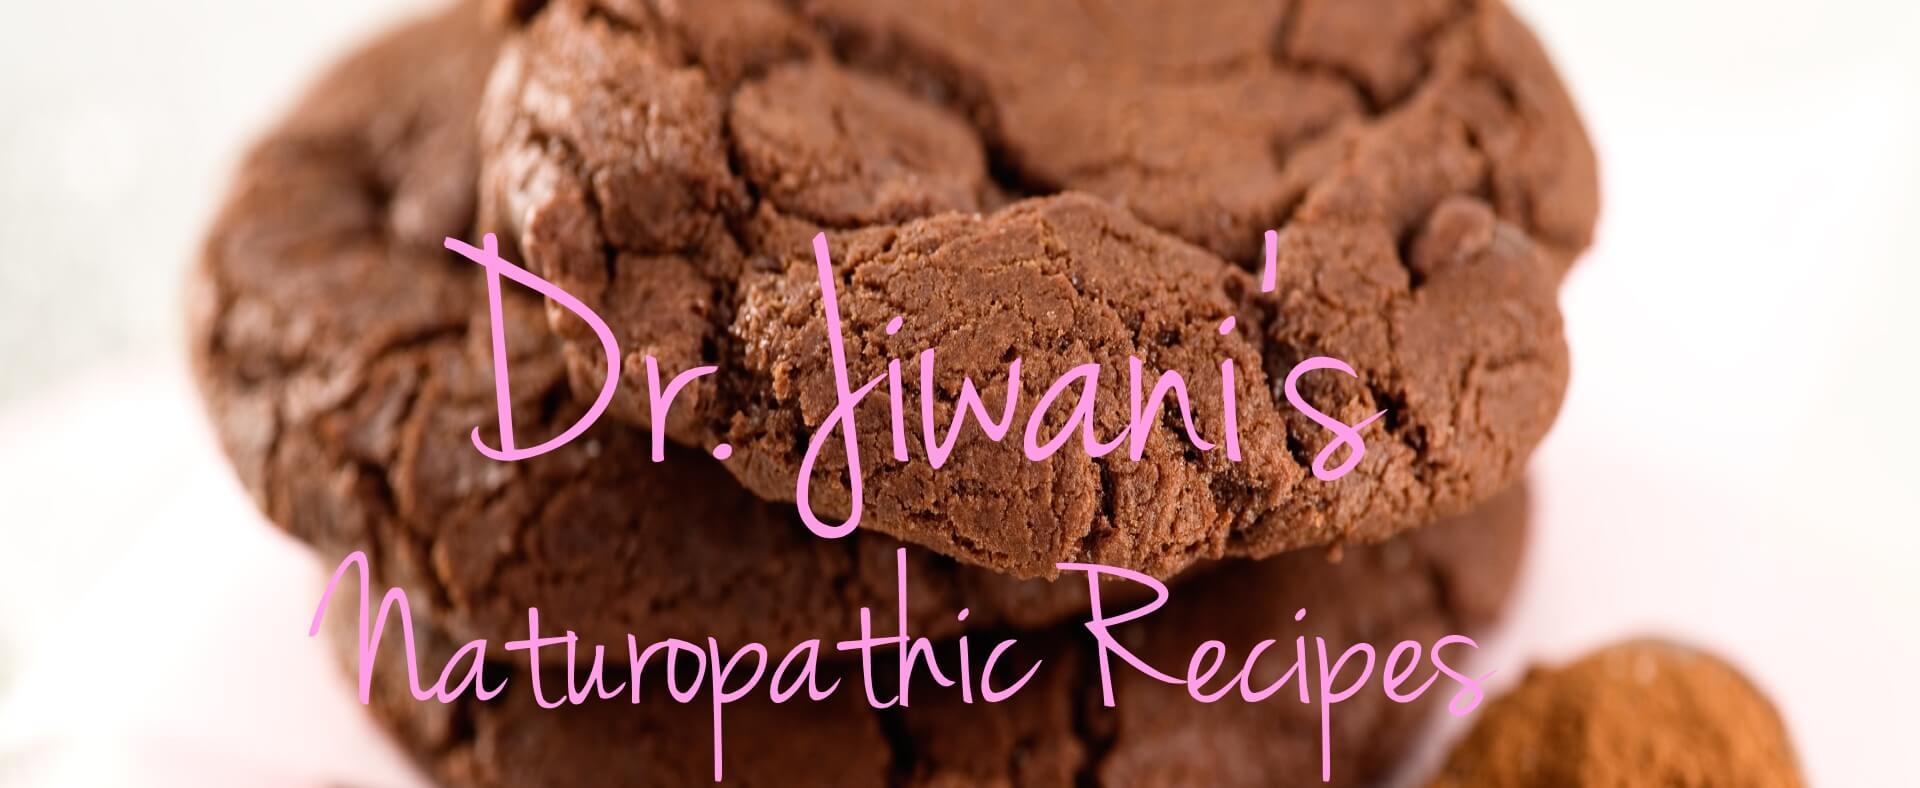 Dr. Jiwani's Naturopathic Recipes: Paleo Keto Vegan Low Carb, Gluten-Free, Egg-Free, Dairy-Free, Soy-Free, Corn-Free | Dr. Jiwani's Naturopathic Nuggets Blog